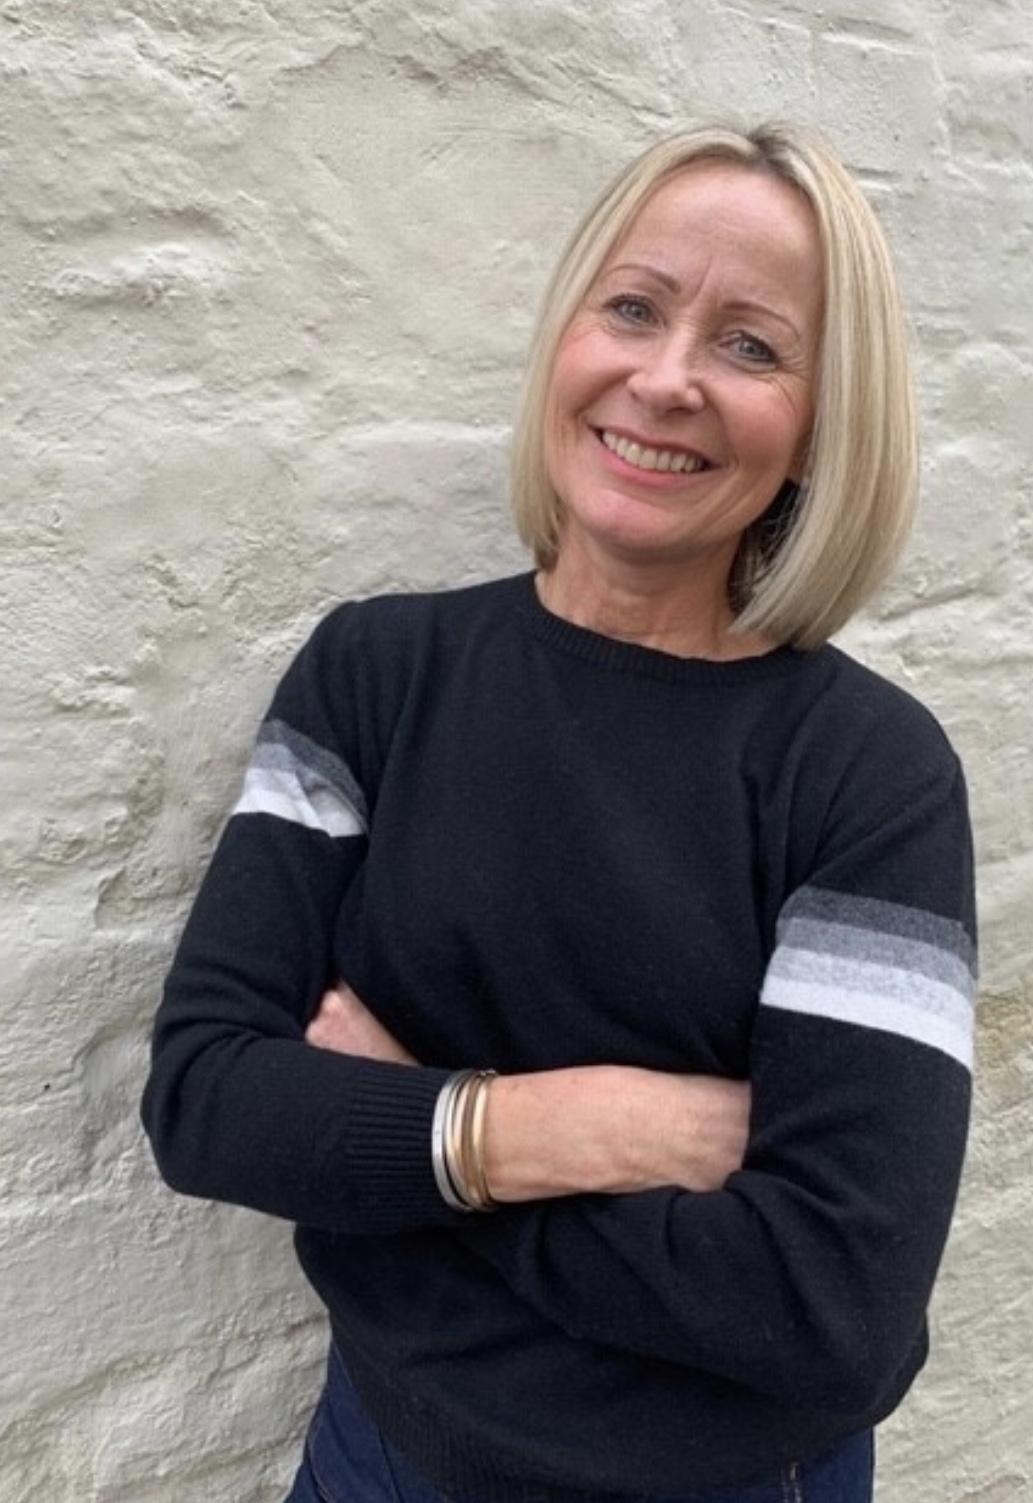 Luella Cashmere Mix Sweater - Lindy Black Stripe Detail WAS £59